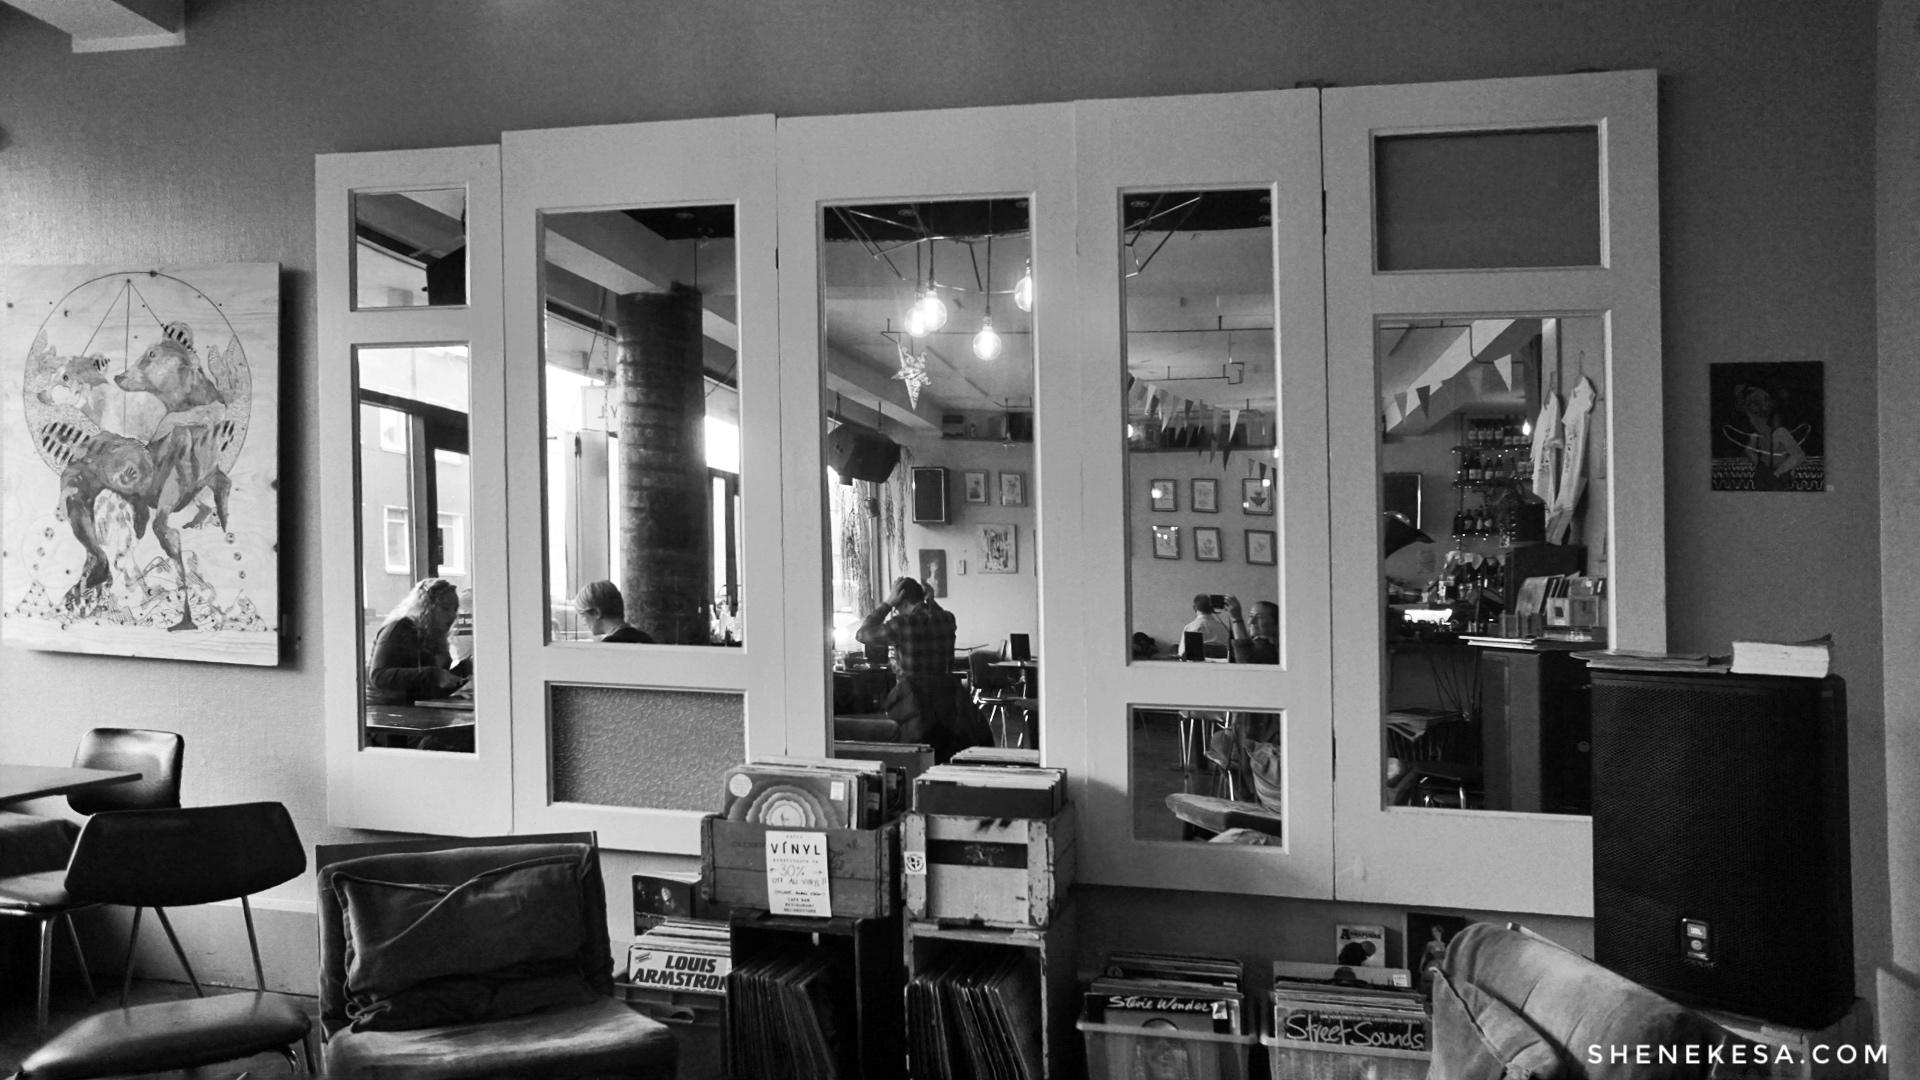 Kaffi Vínyl Reykjavik by She Nekesa